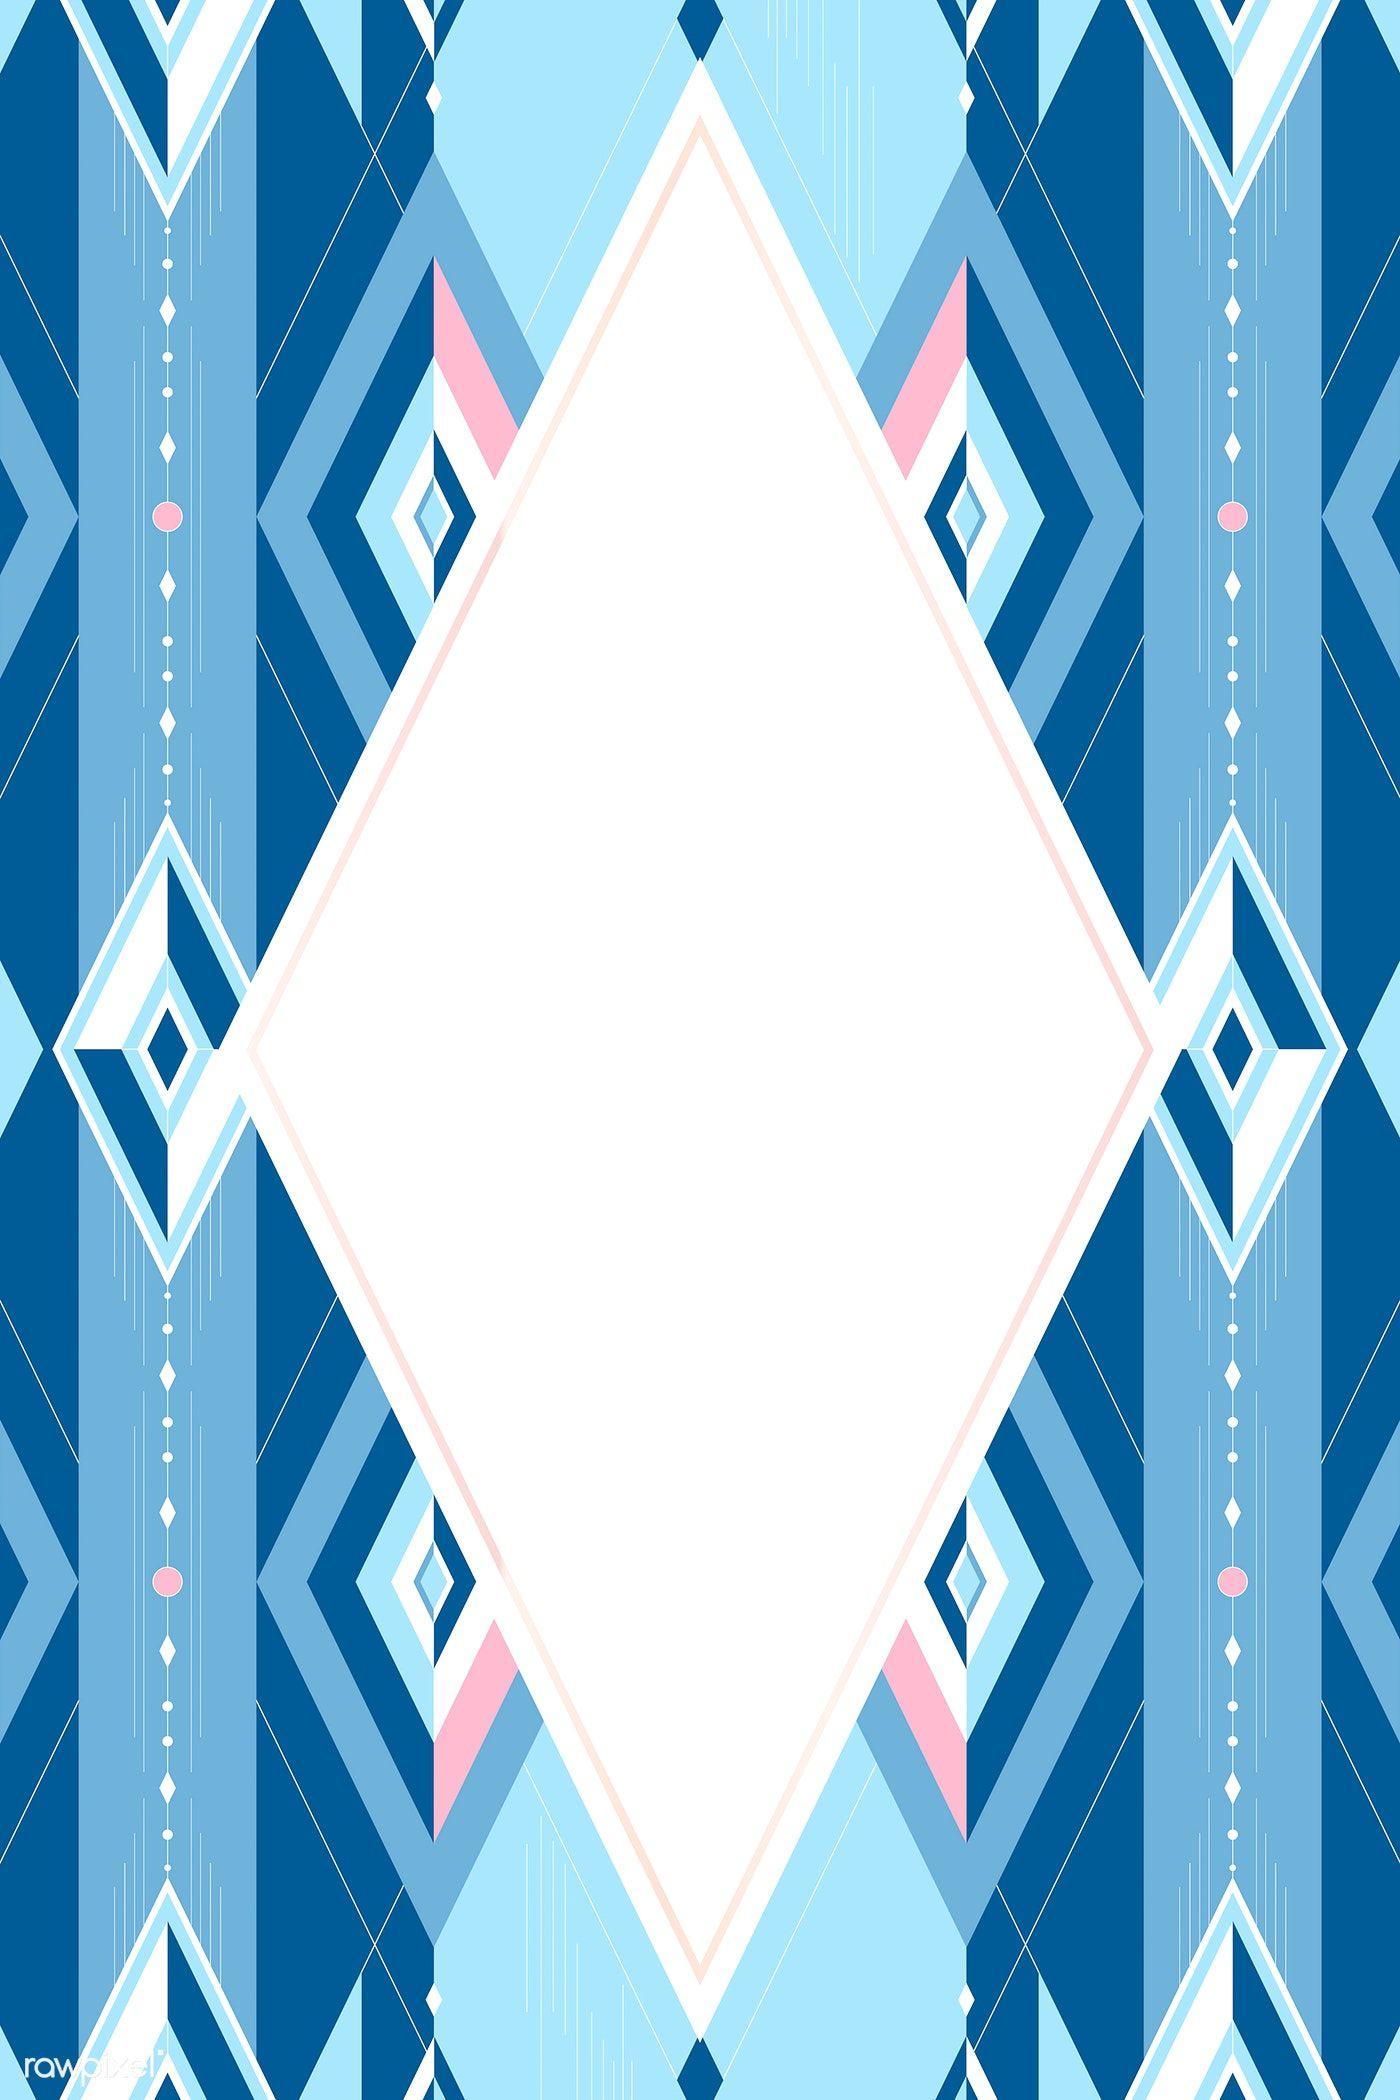 Download premium vector of Bright blue geometric seamless